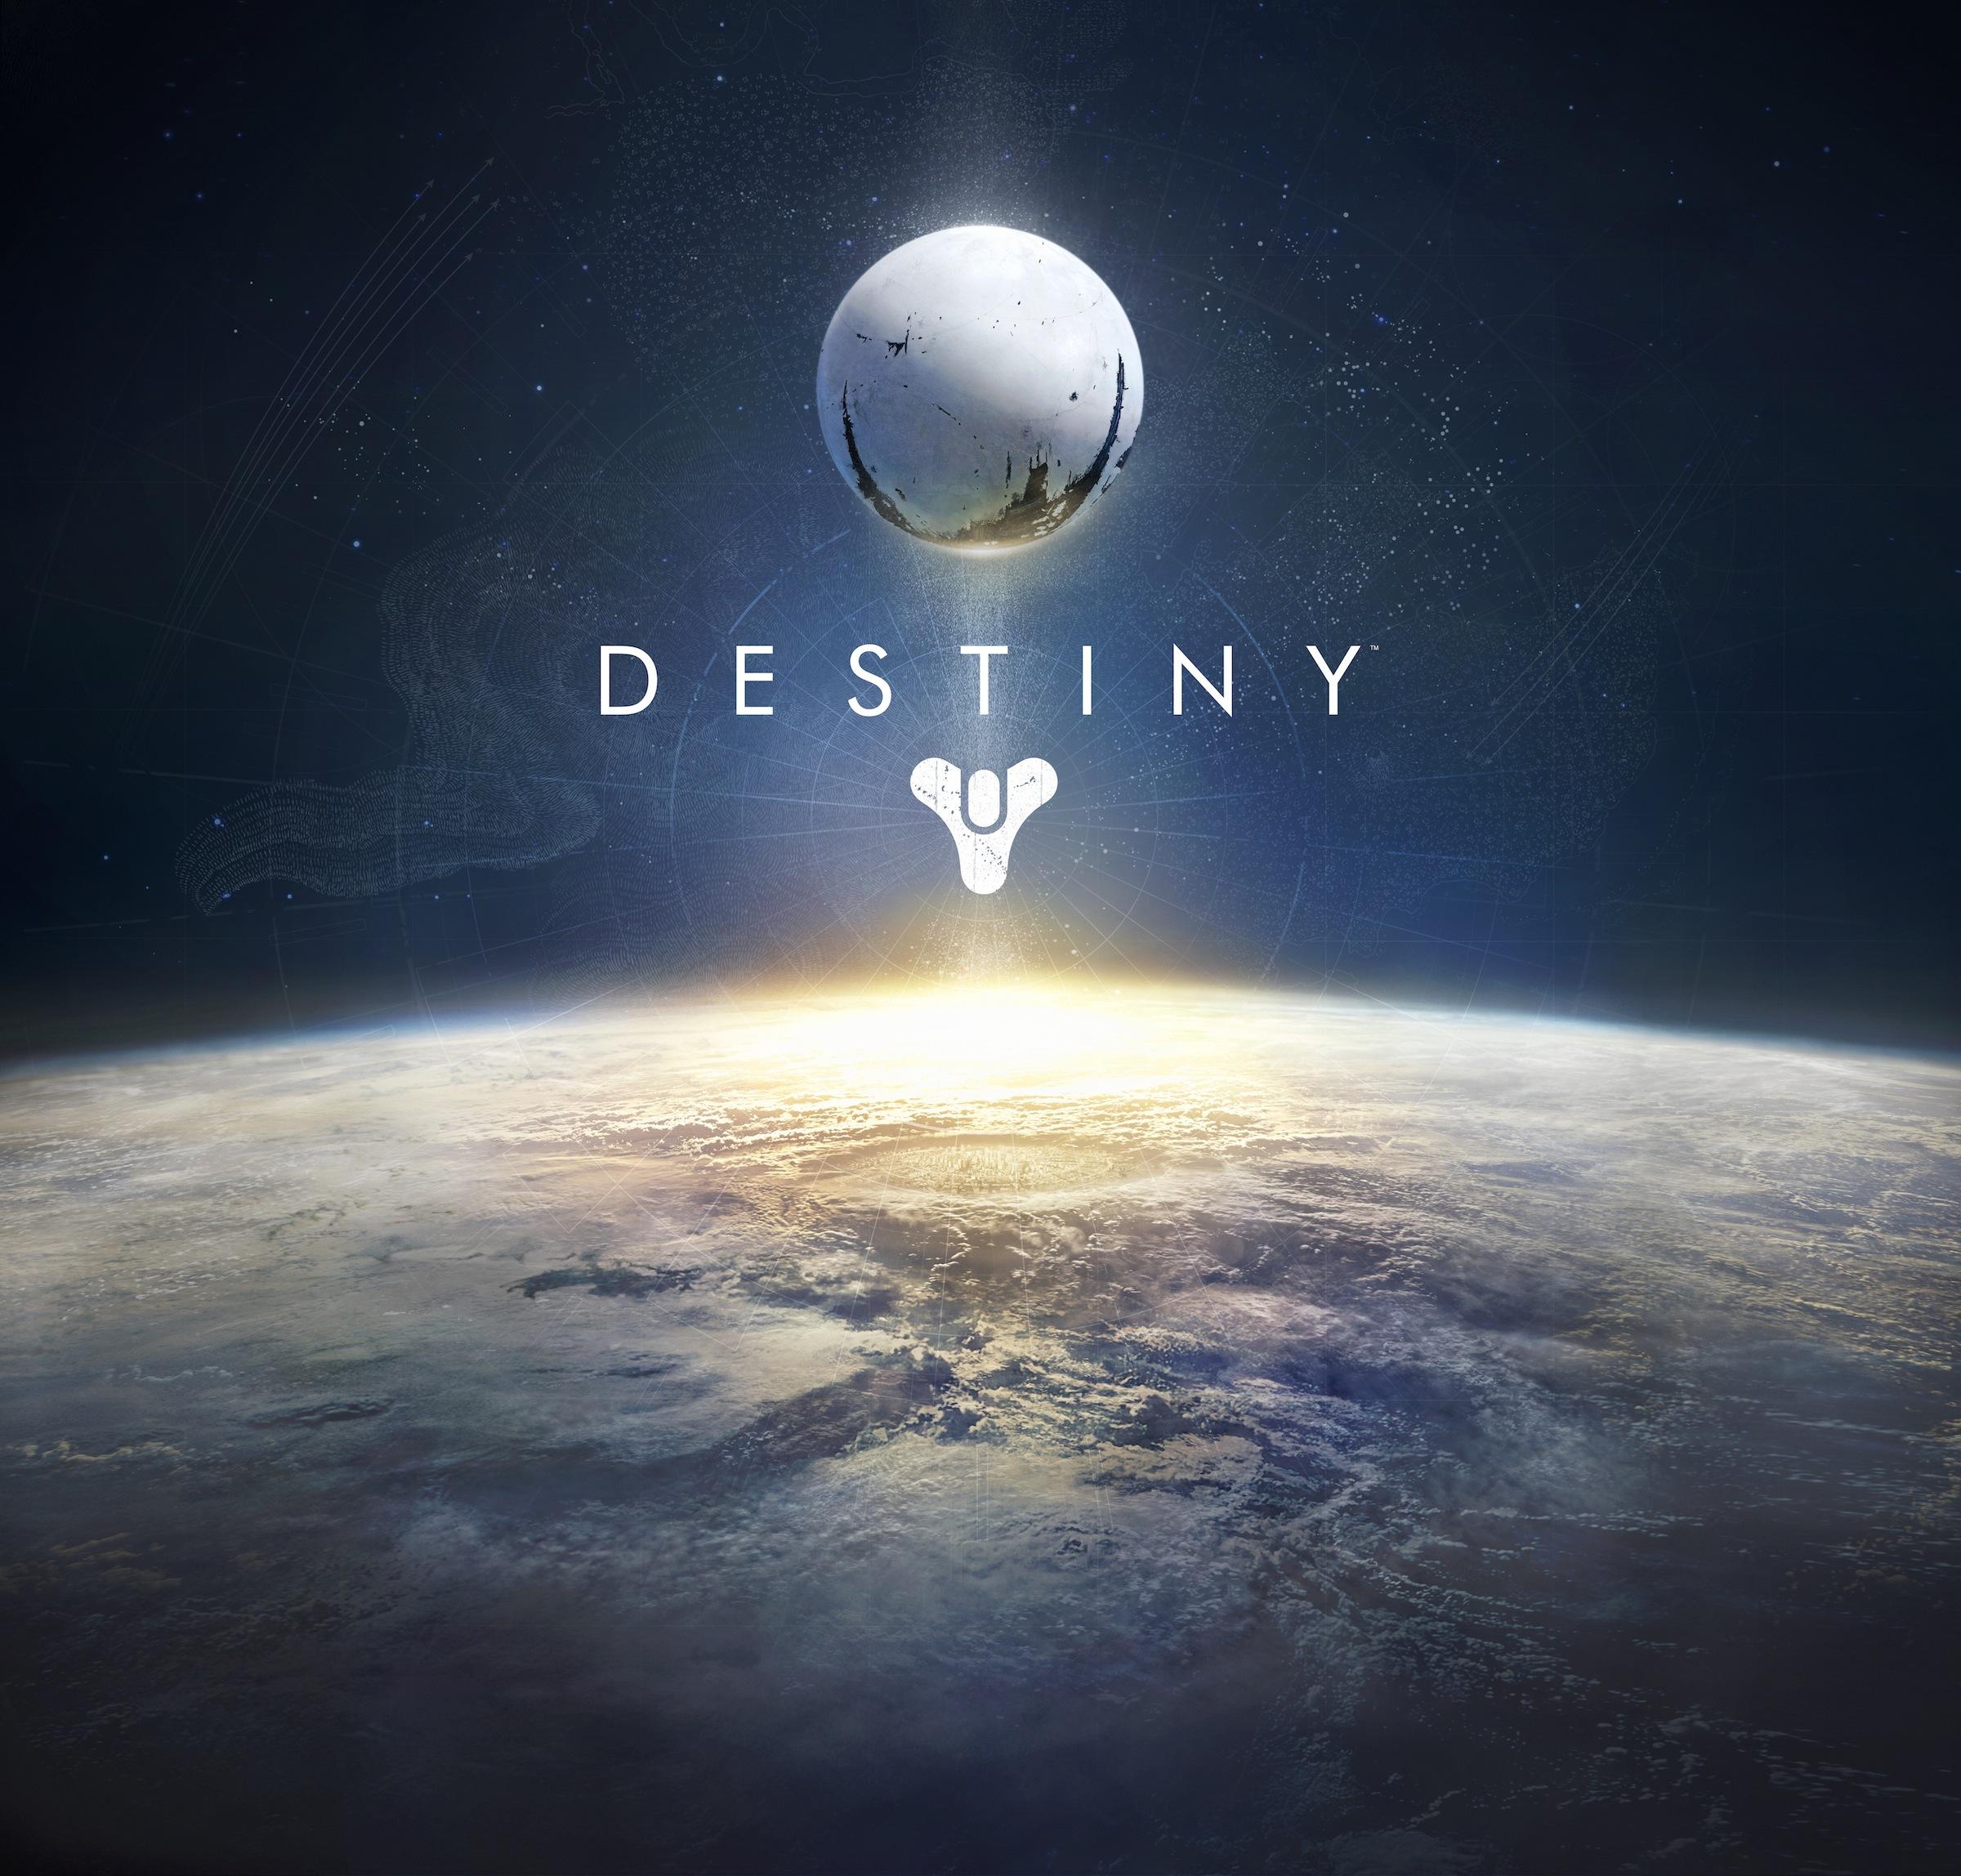 Destiny01